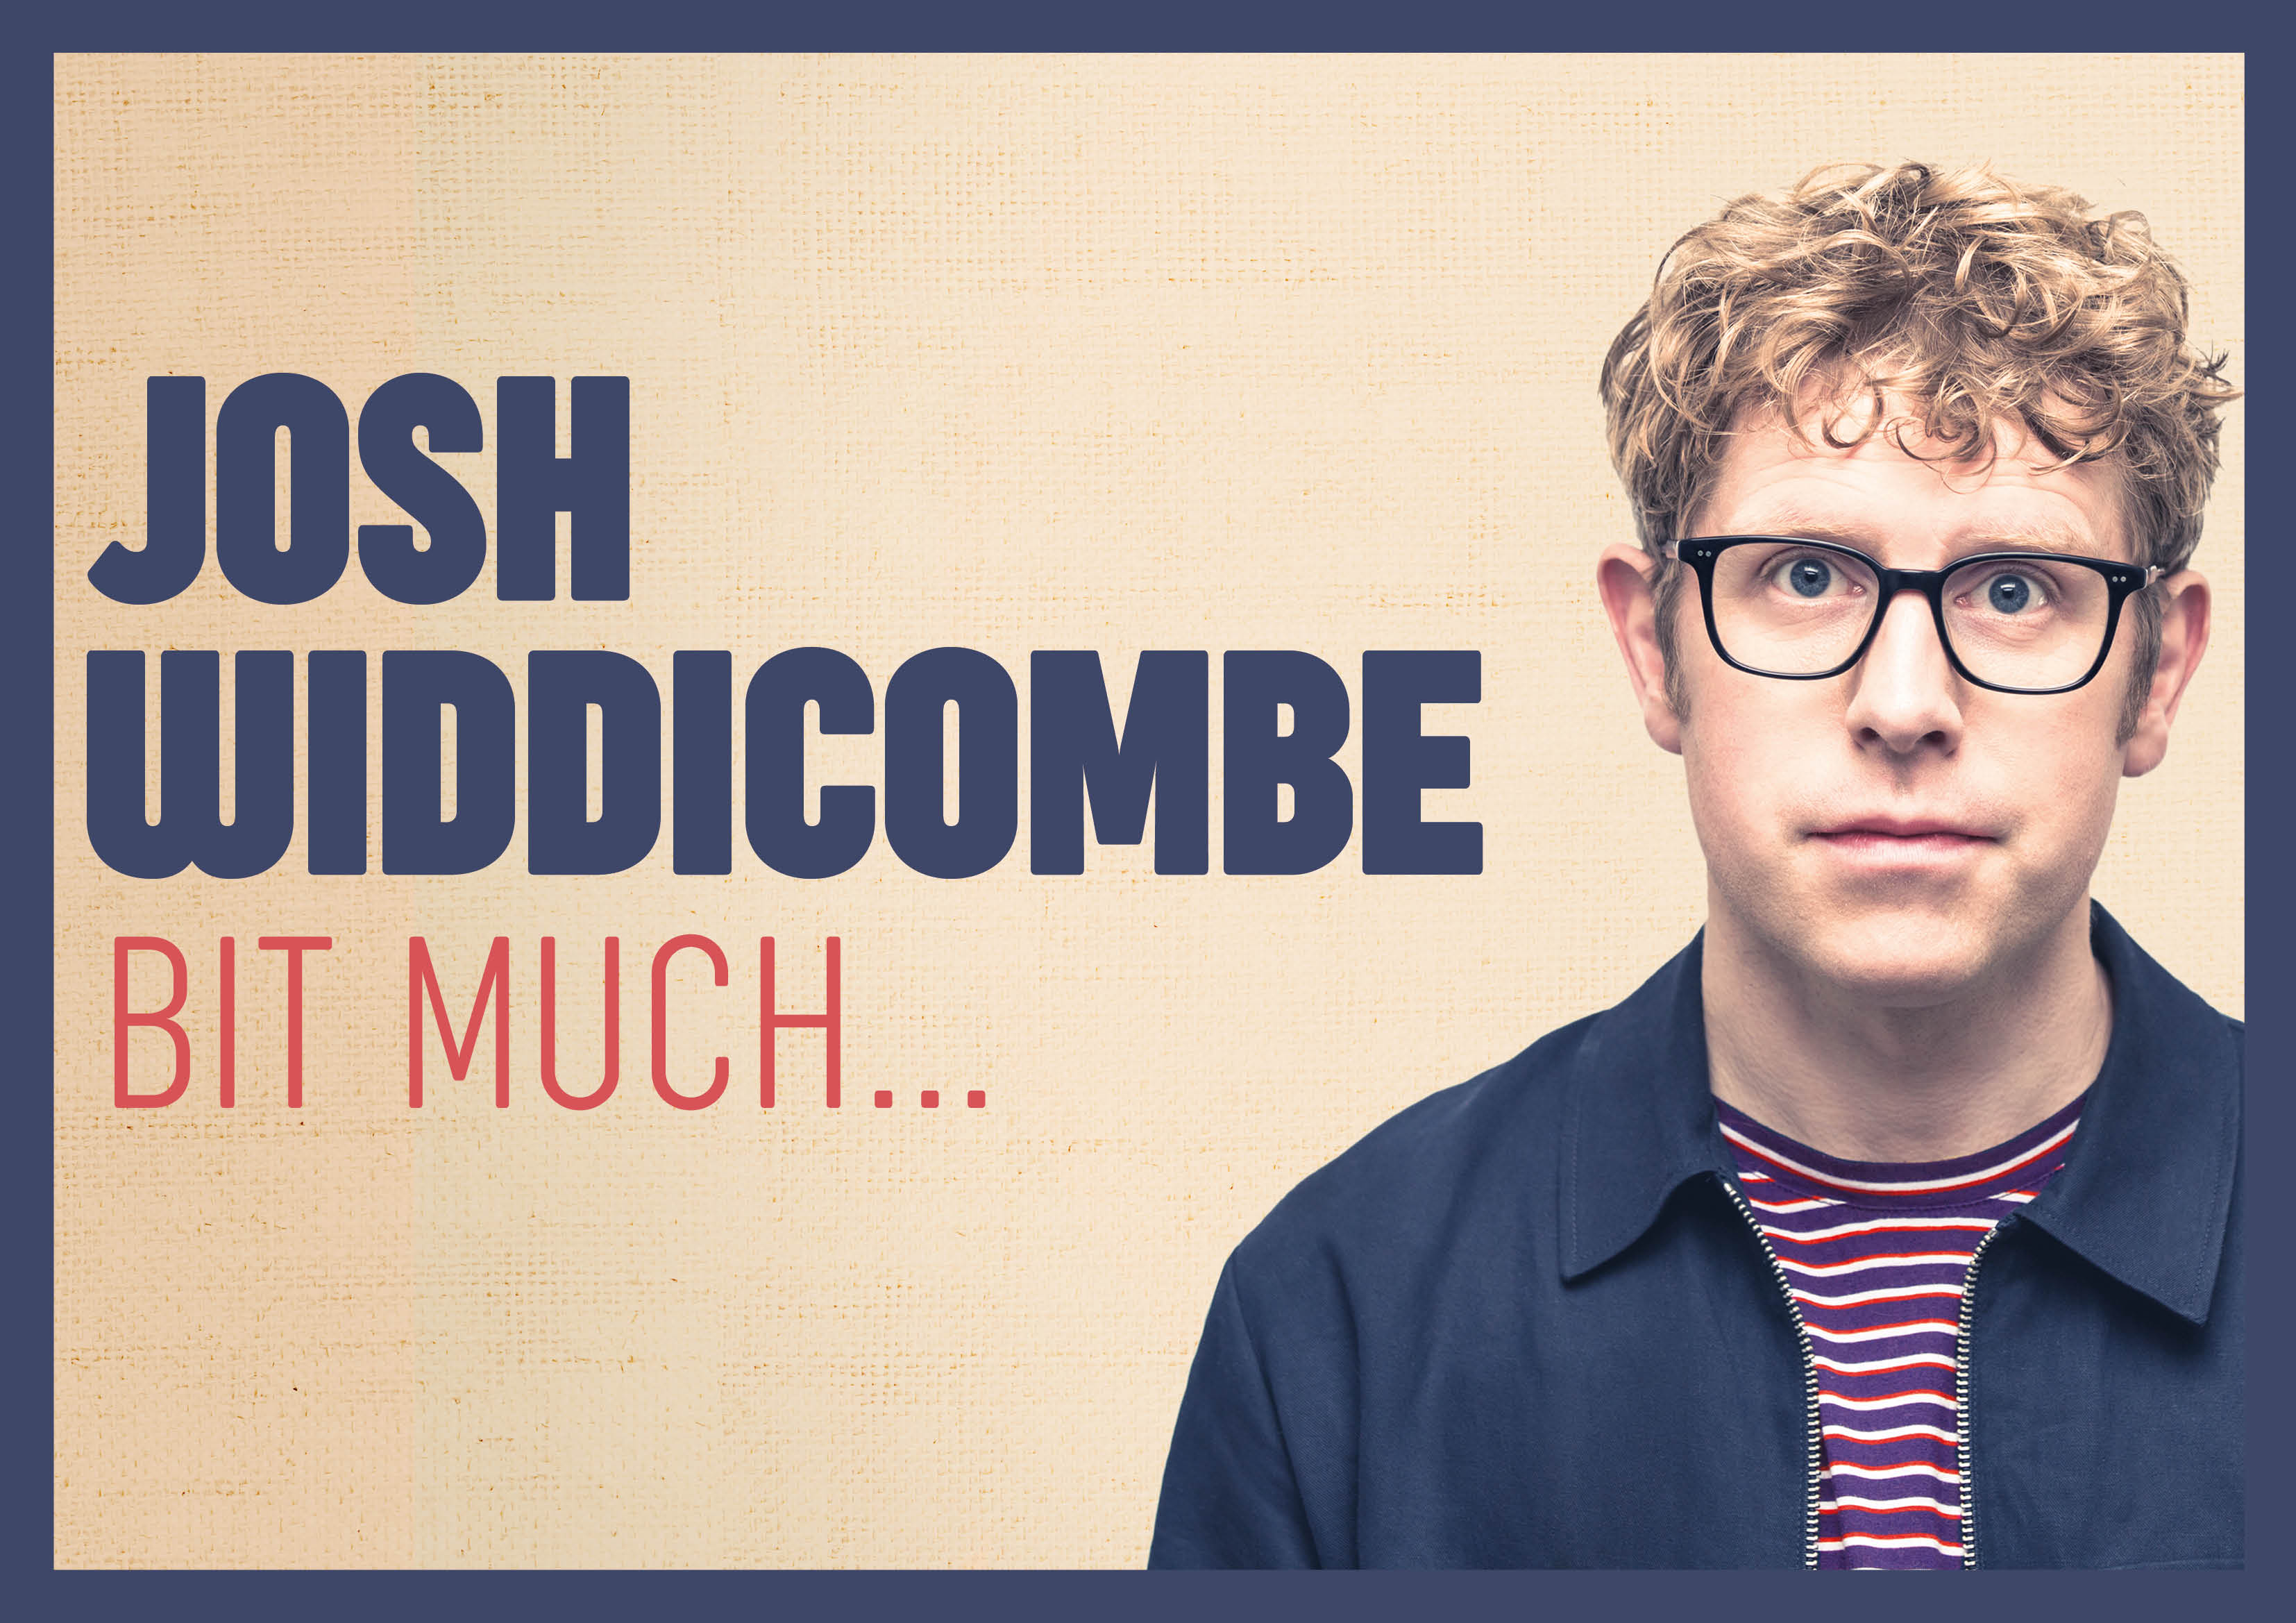 WS: Josh Widdicombe